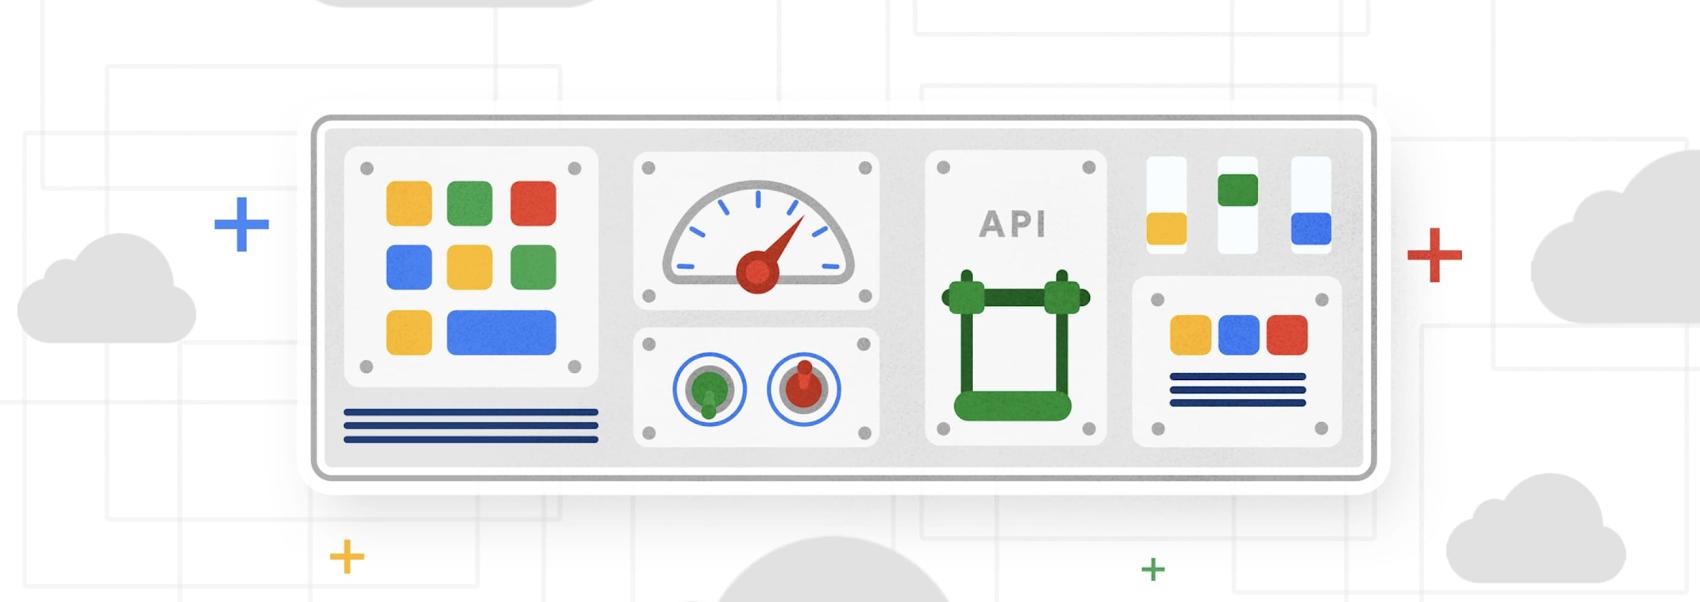 API Dashboard Diagram